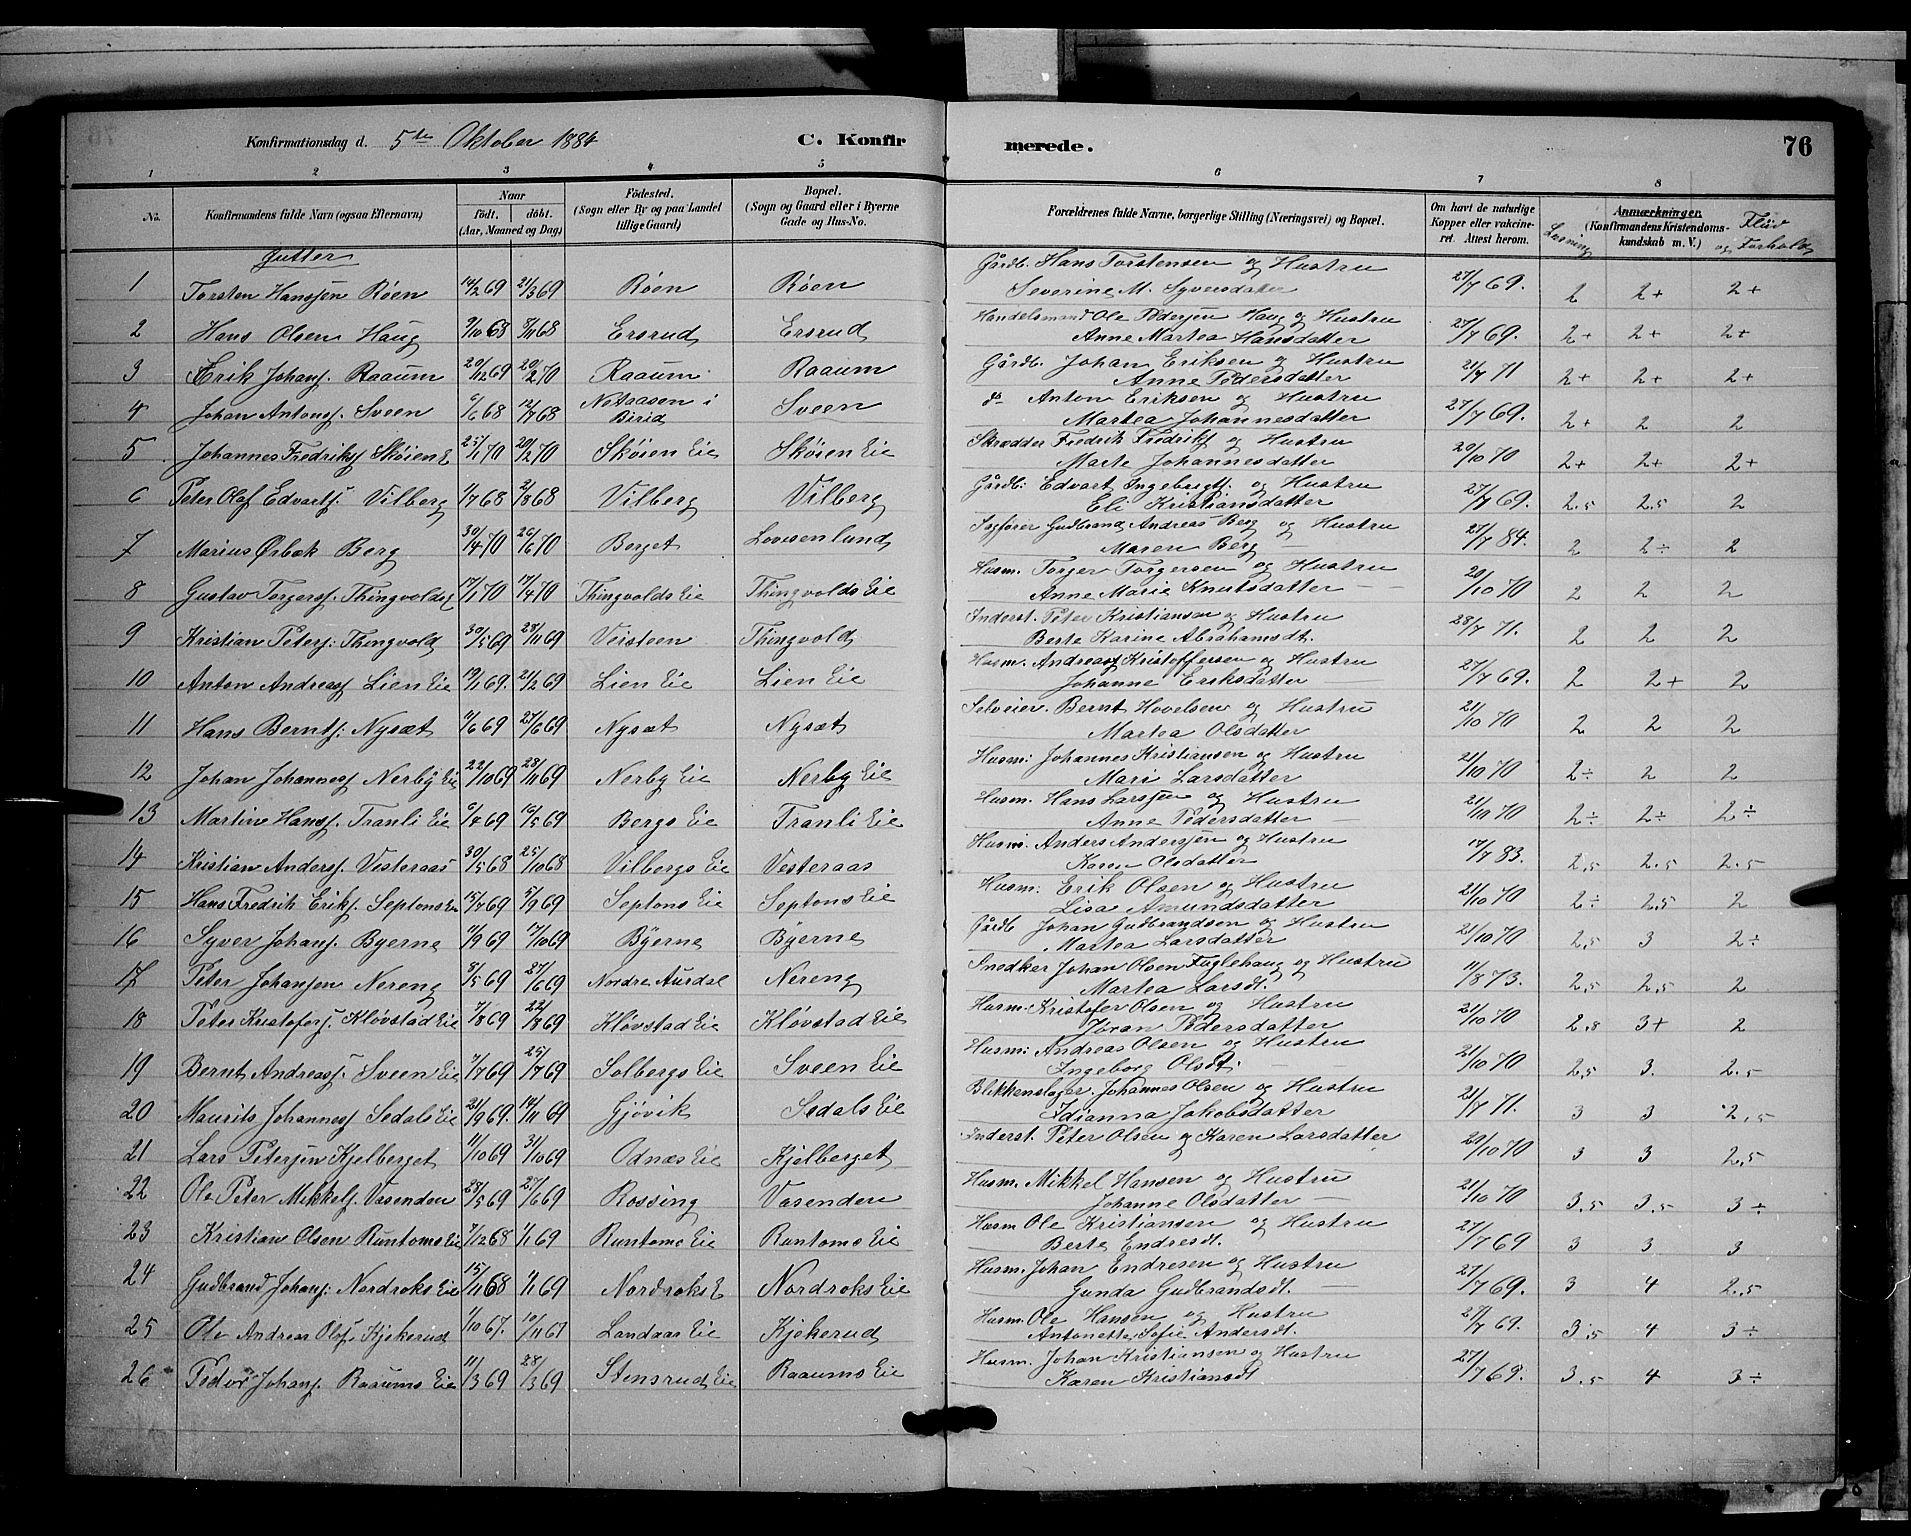 SAH, Søndre Land prestekontor, L/L0003: Klokkerbok nr. 3, 1884-1902, s. 76